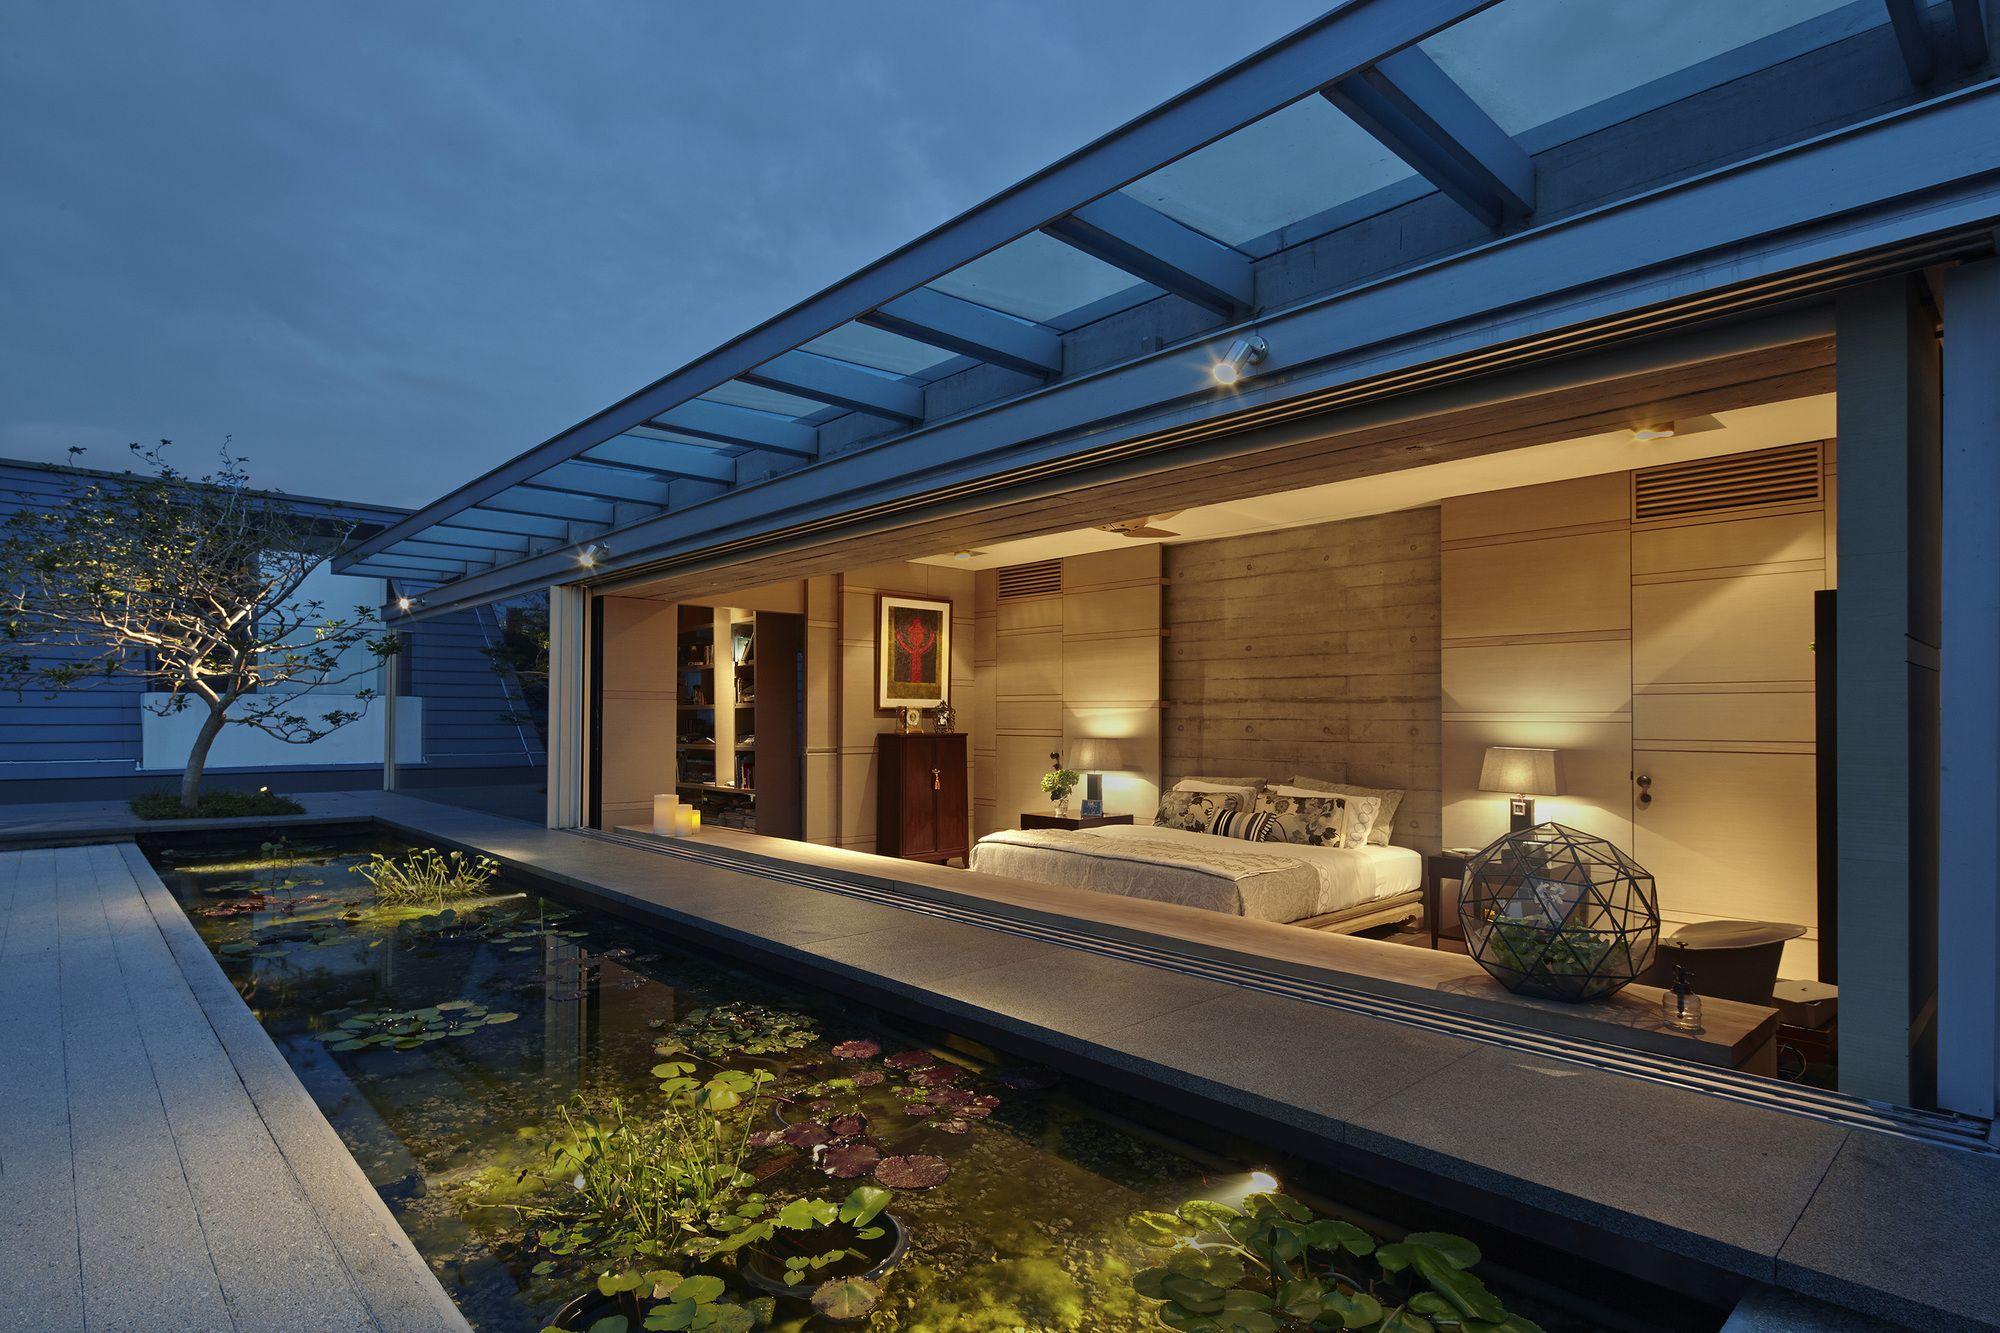 Casa chiltern wow architects warner wong design